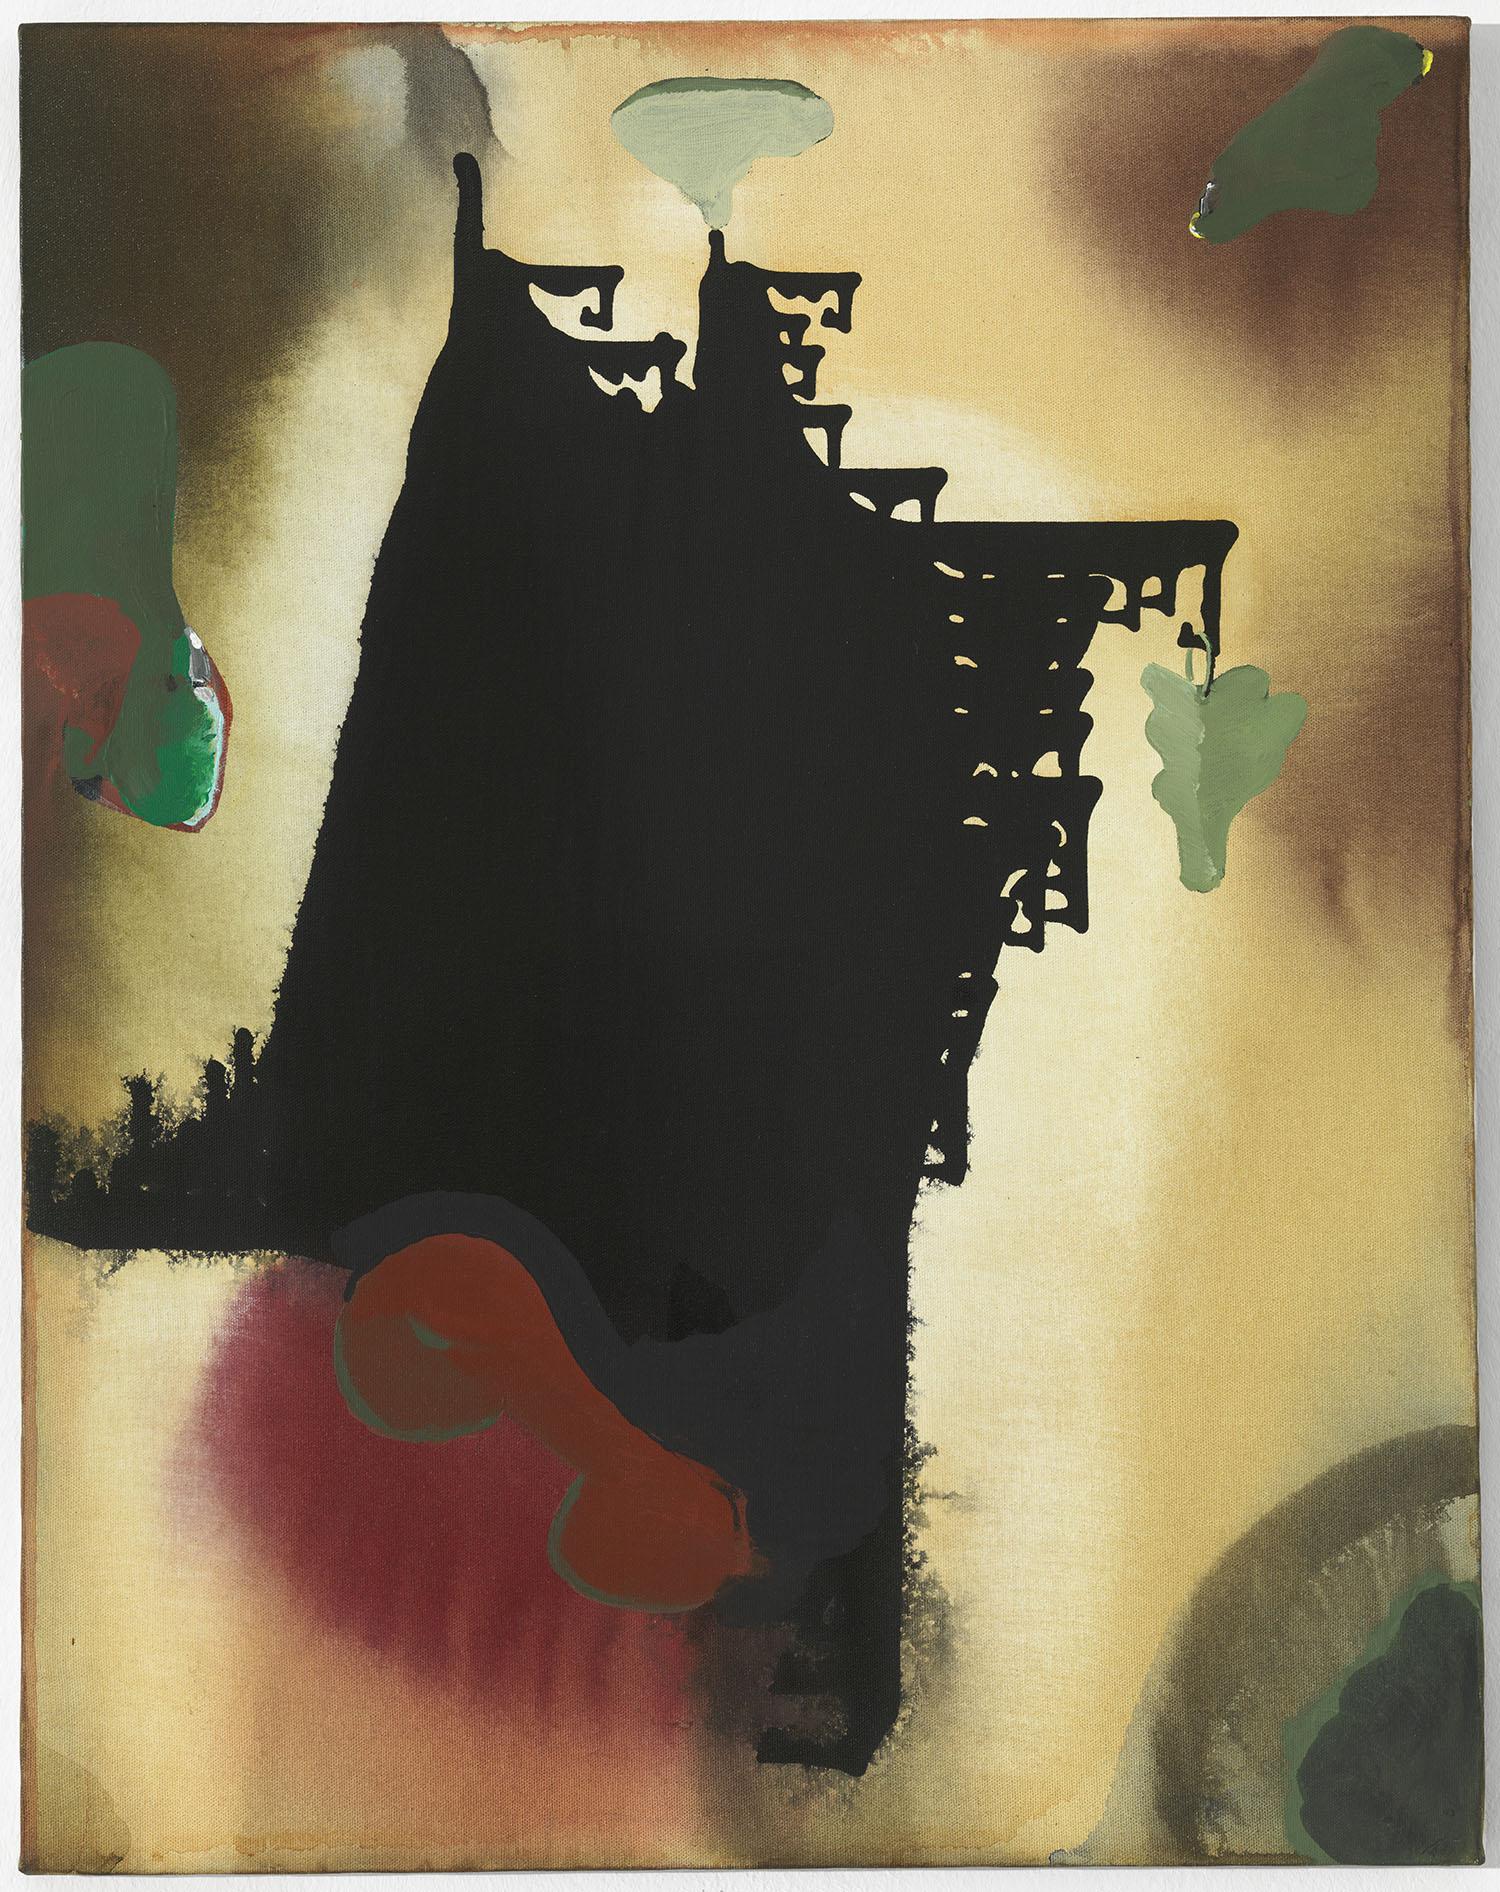 o.T. | 1998 | Acryl auf Leinwand | 71 x 56 cm